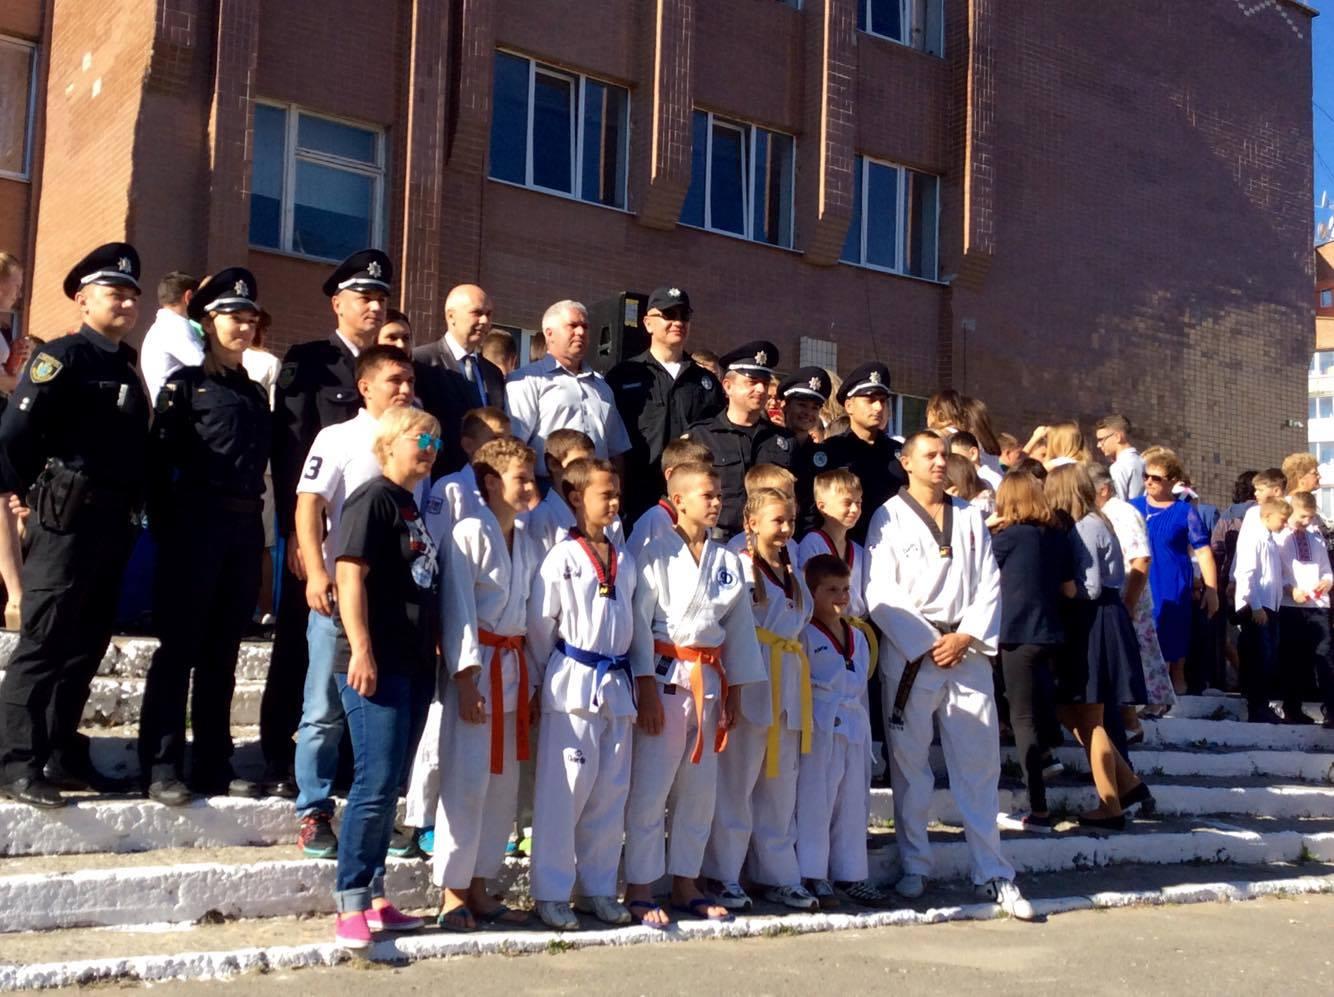 Хмельницький НВК№10 на Першовересень заполонили поліцейські - фото 12